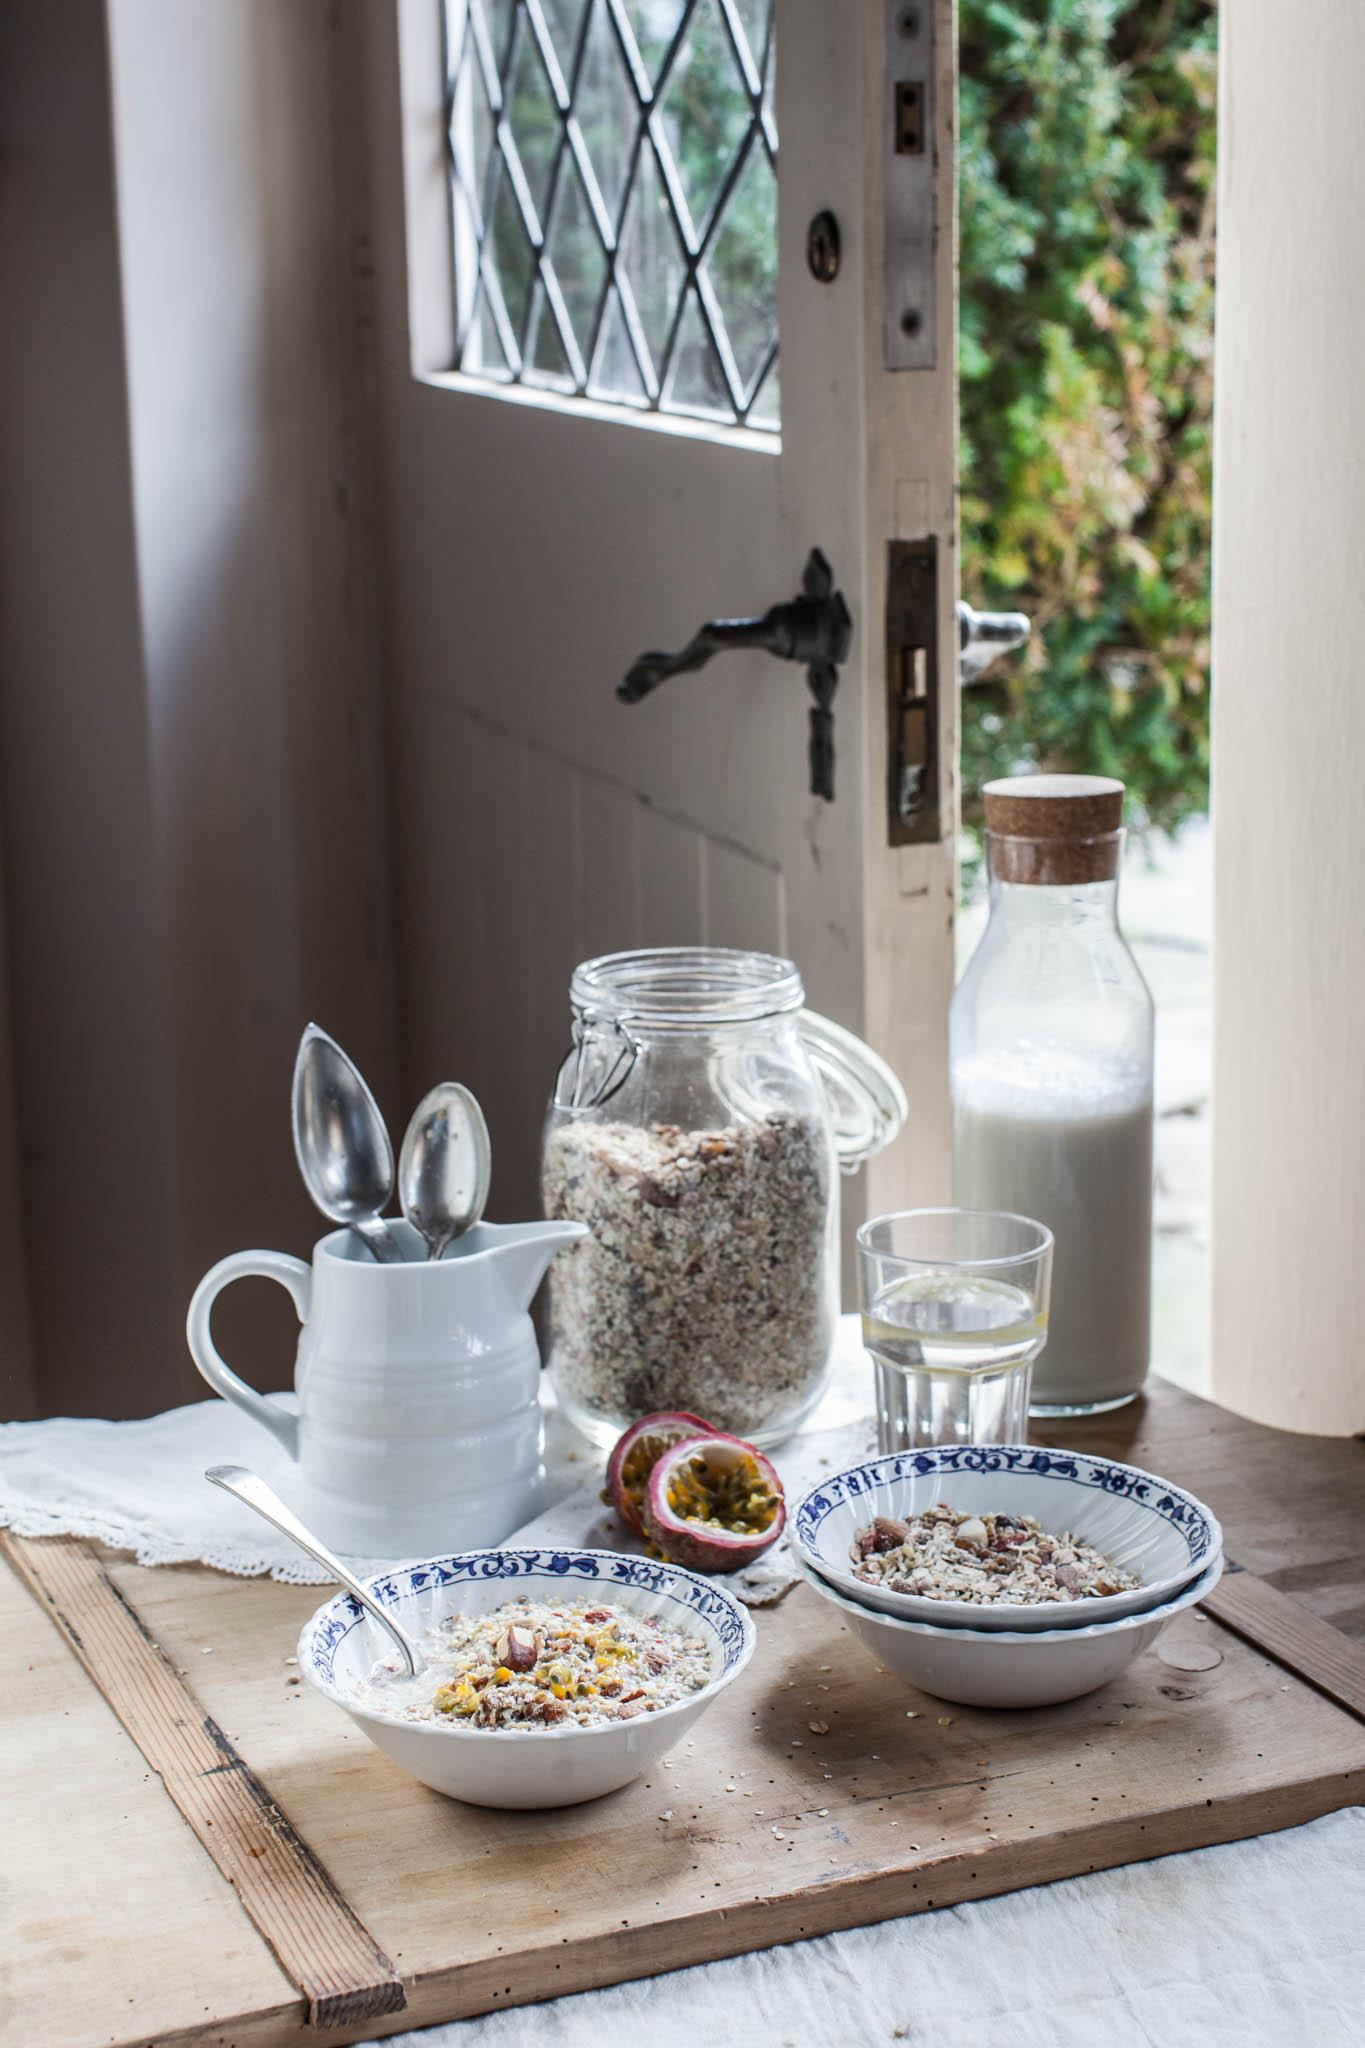 Home made gluten free super muesli recipe. Photography by Sussex photographer Emma Gutteridge